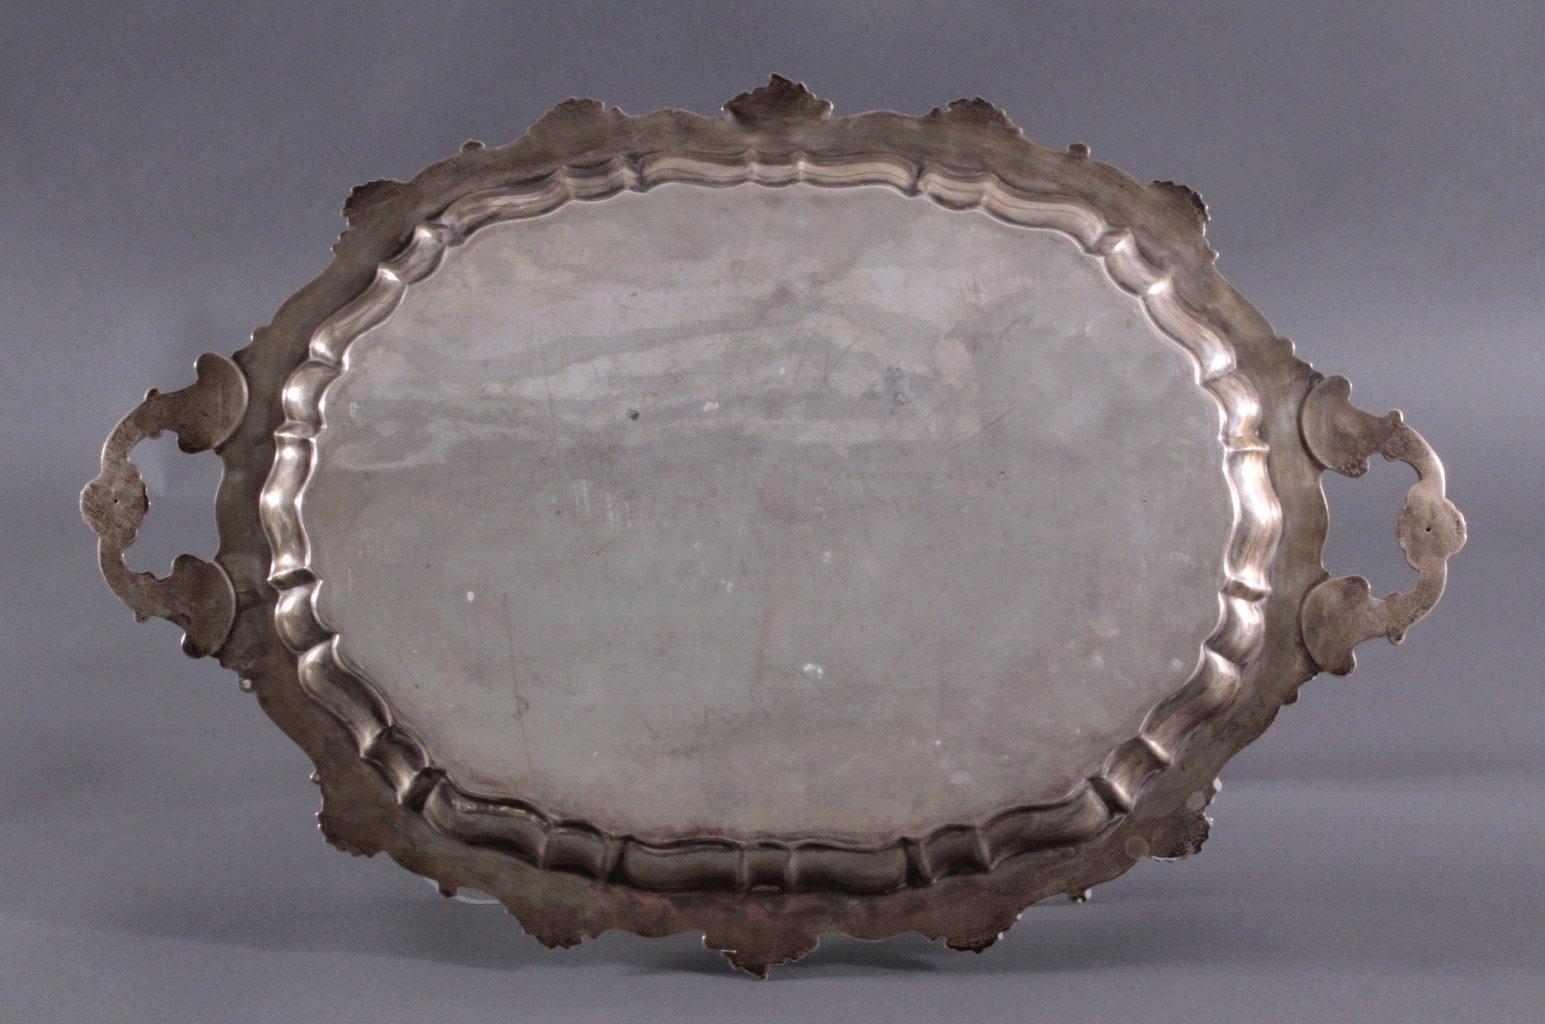 Großes Silber-Tablett, Spanien 1. Hälfte 20. Jh.-1